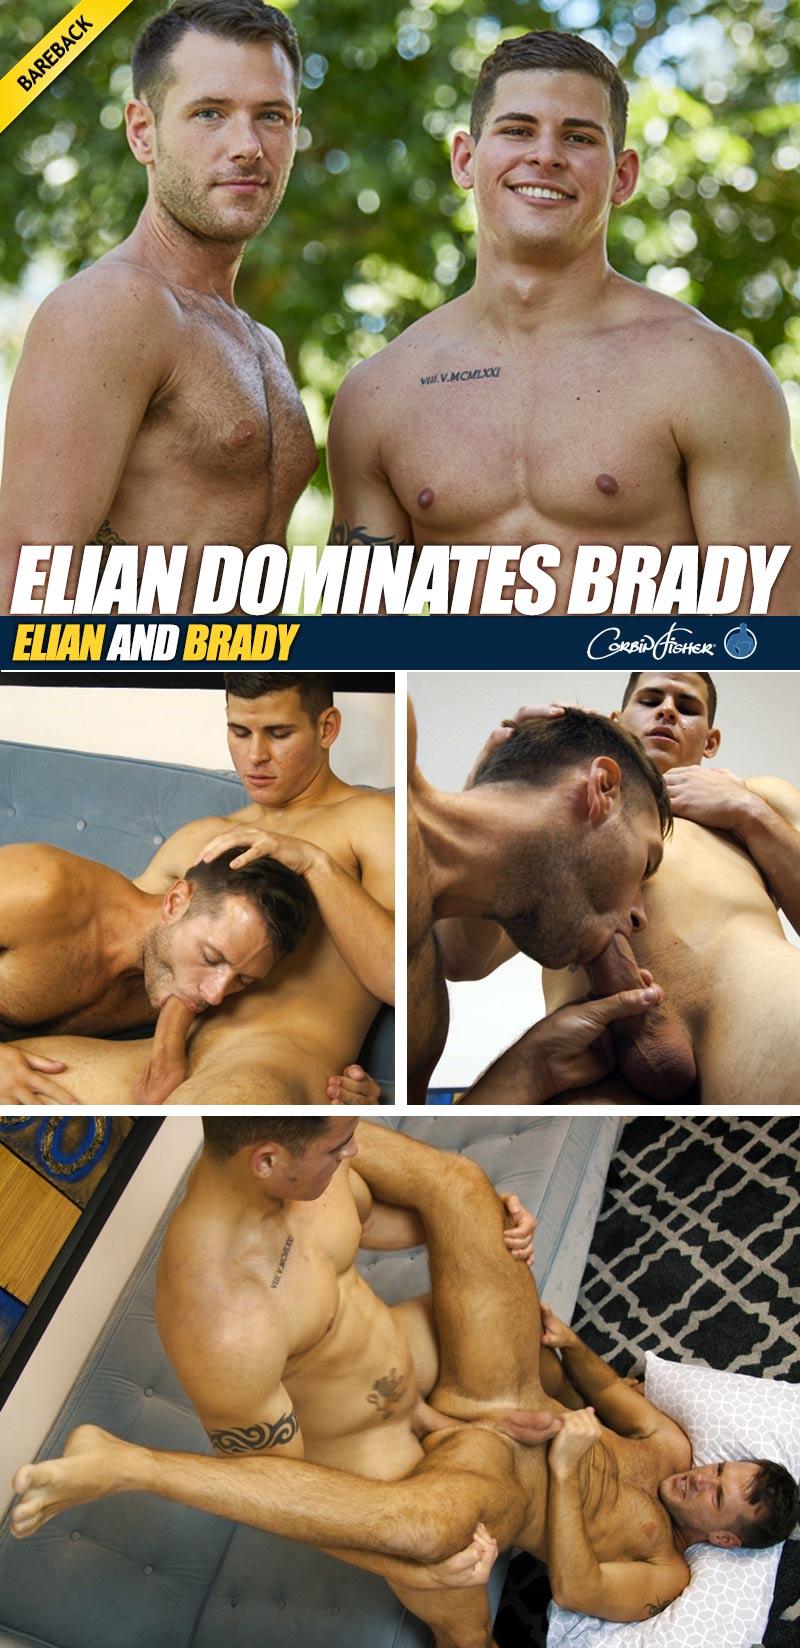 Elian Dominates Brady (Bareback) at CorbinFisher